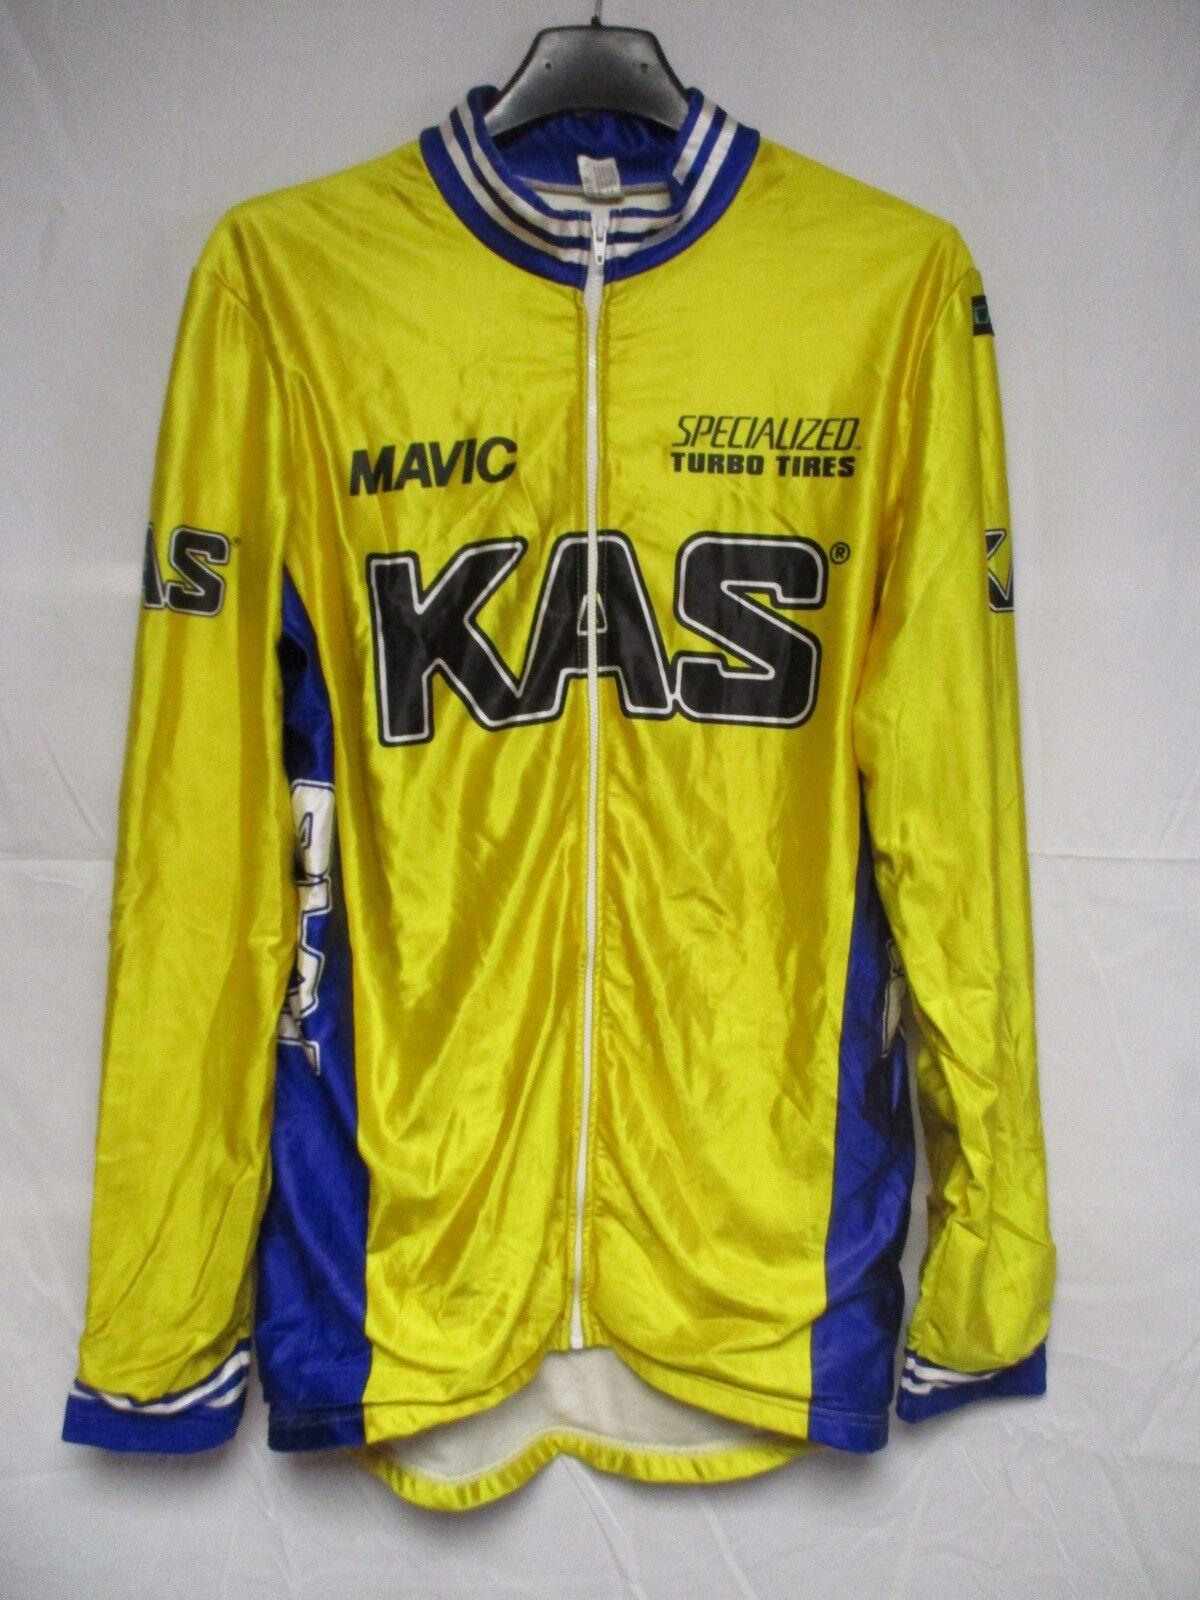 Veste cycliste KAS MAVIC SPECIALIZED jacke jacket giacca chaqueta amarillo 3 M